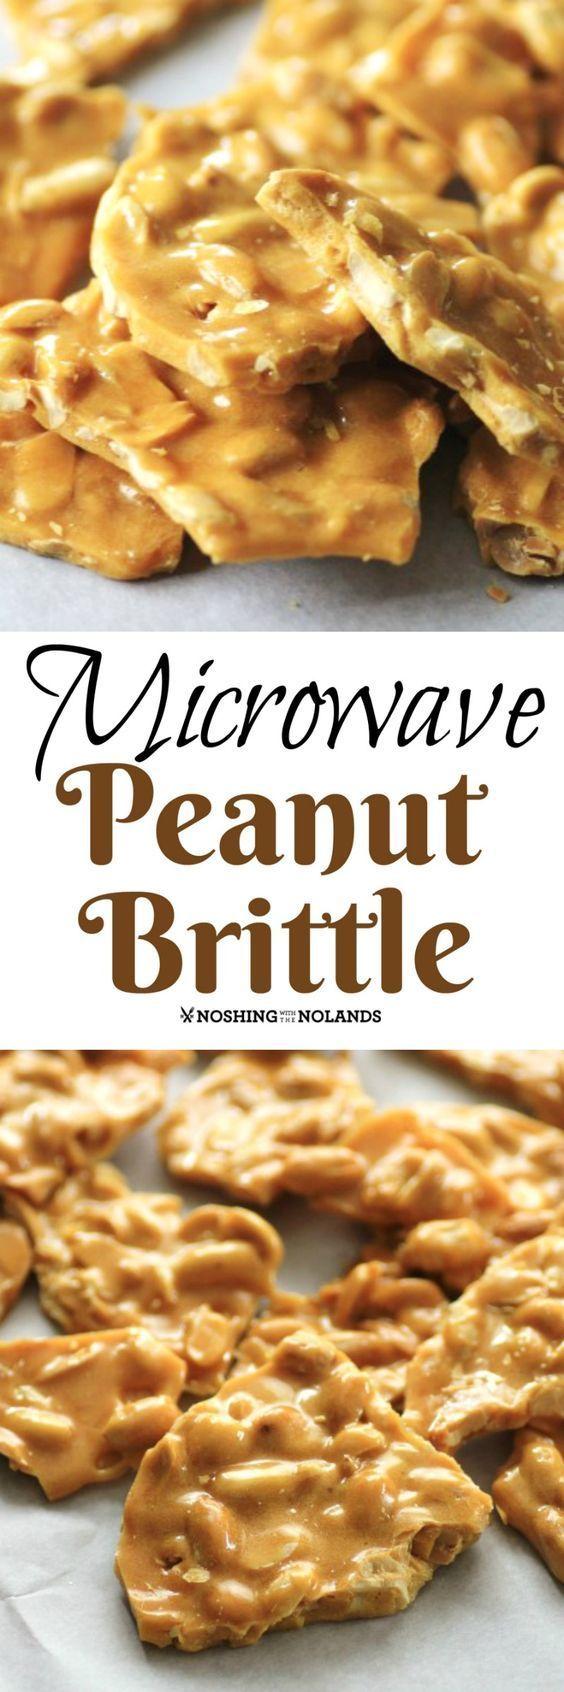 Peanut Butter Cheesecake With Peanut Brittle Recipe — Dishmaps